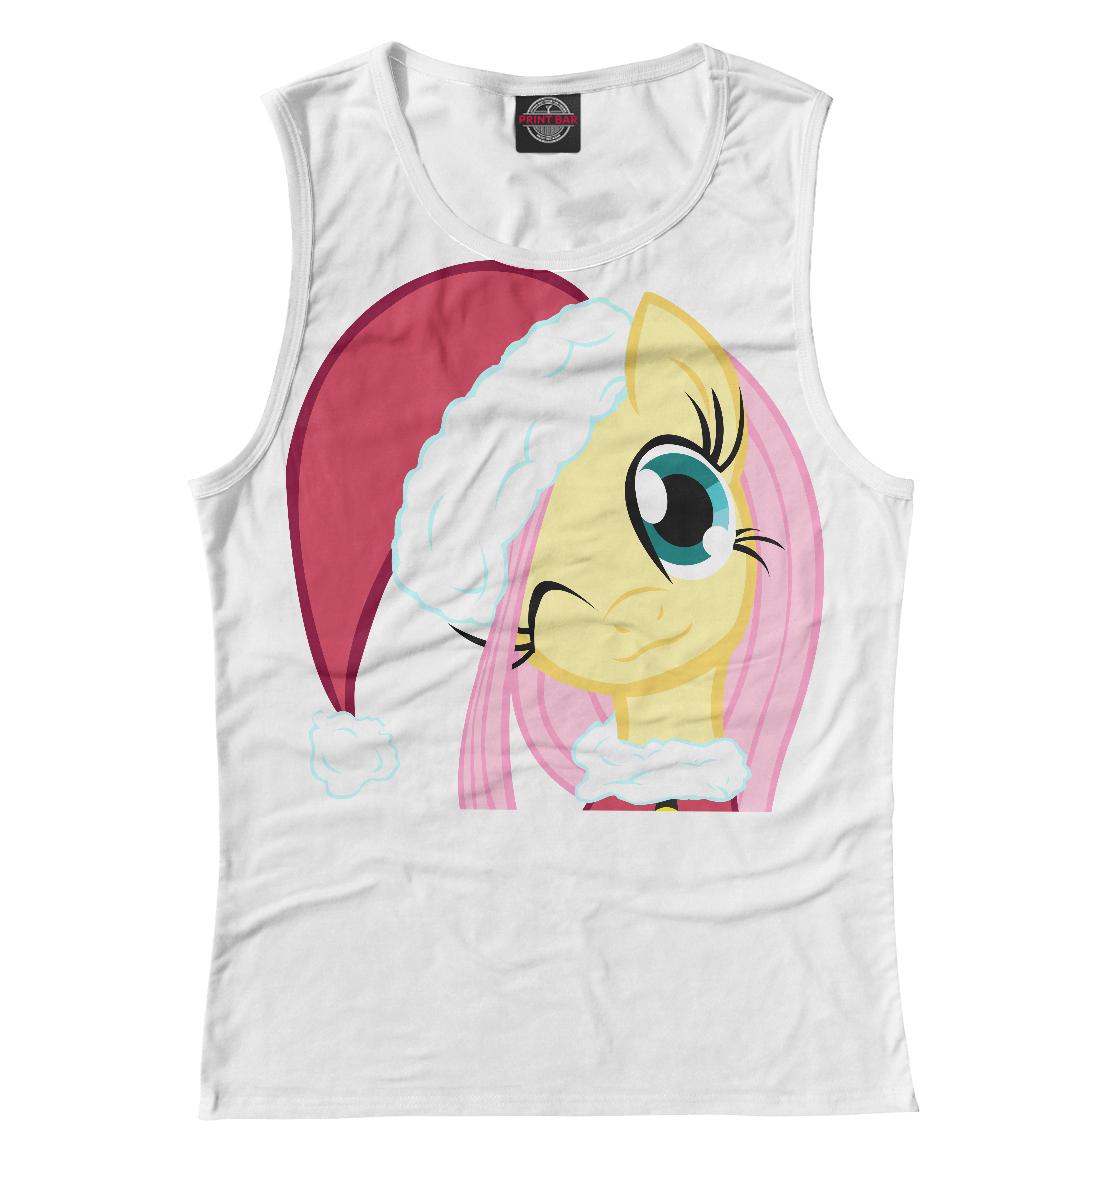 Фото - My Little Pony my magical flying pony